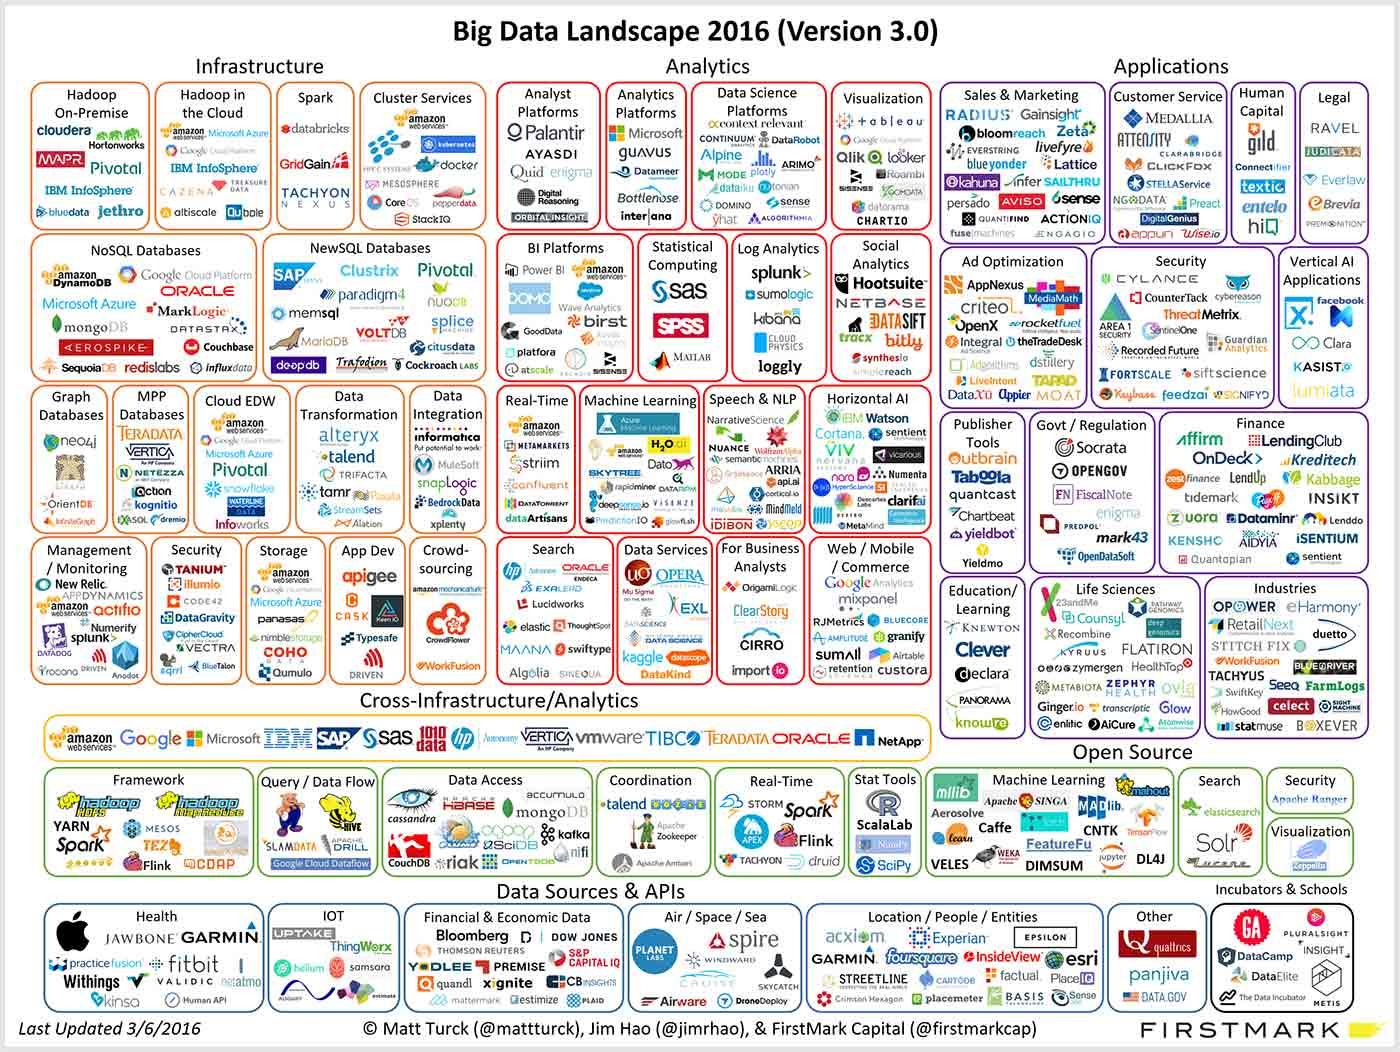 Landscape of big data applications